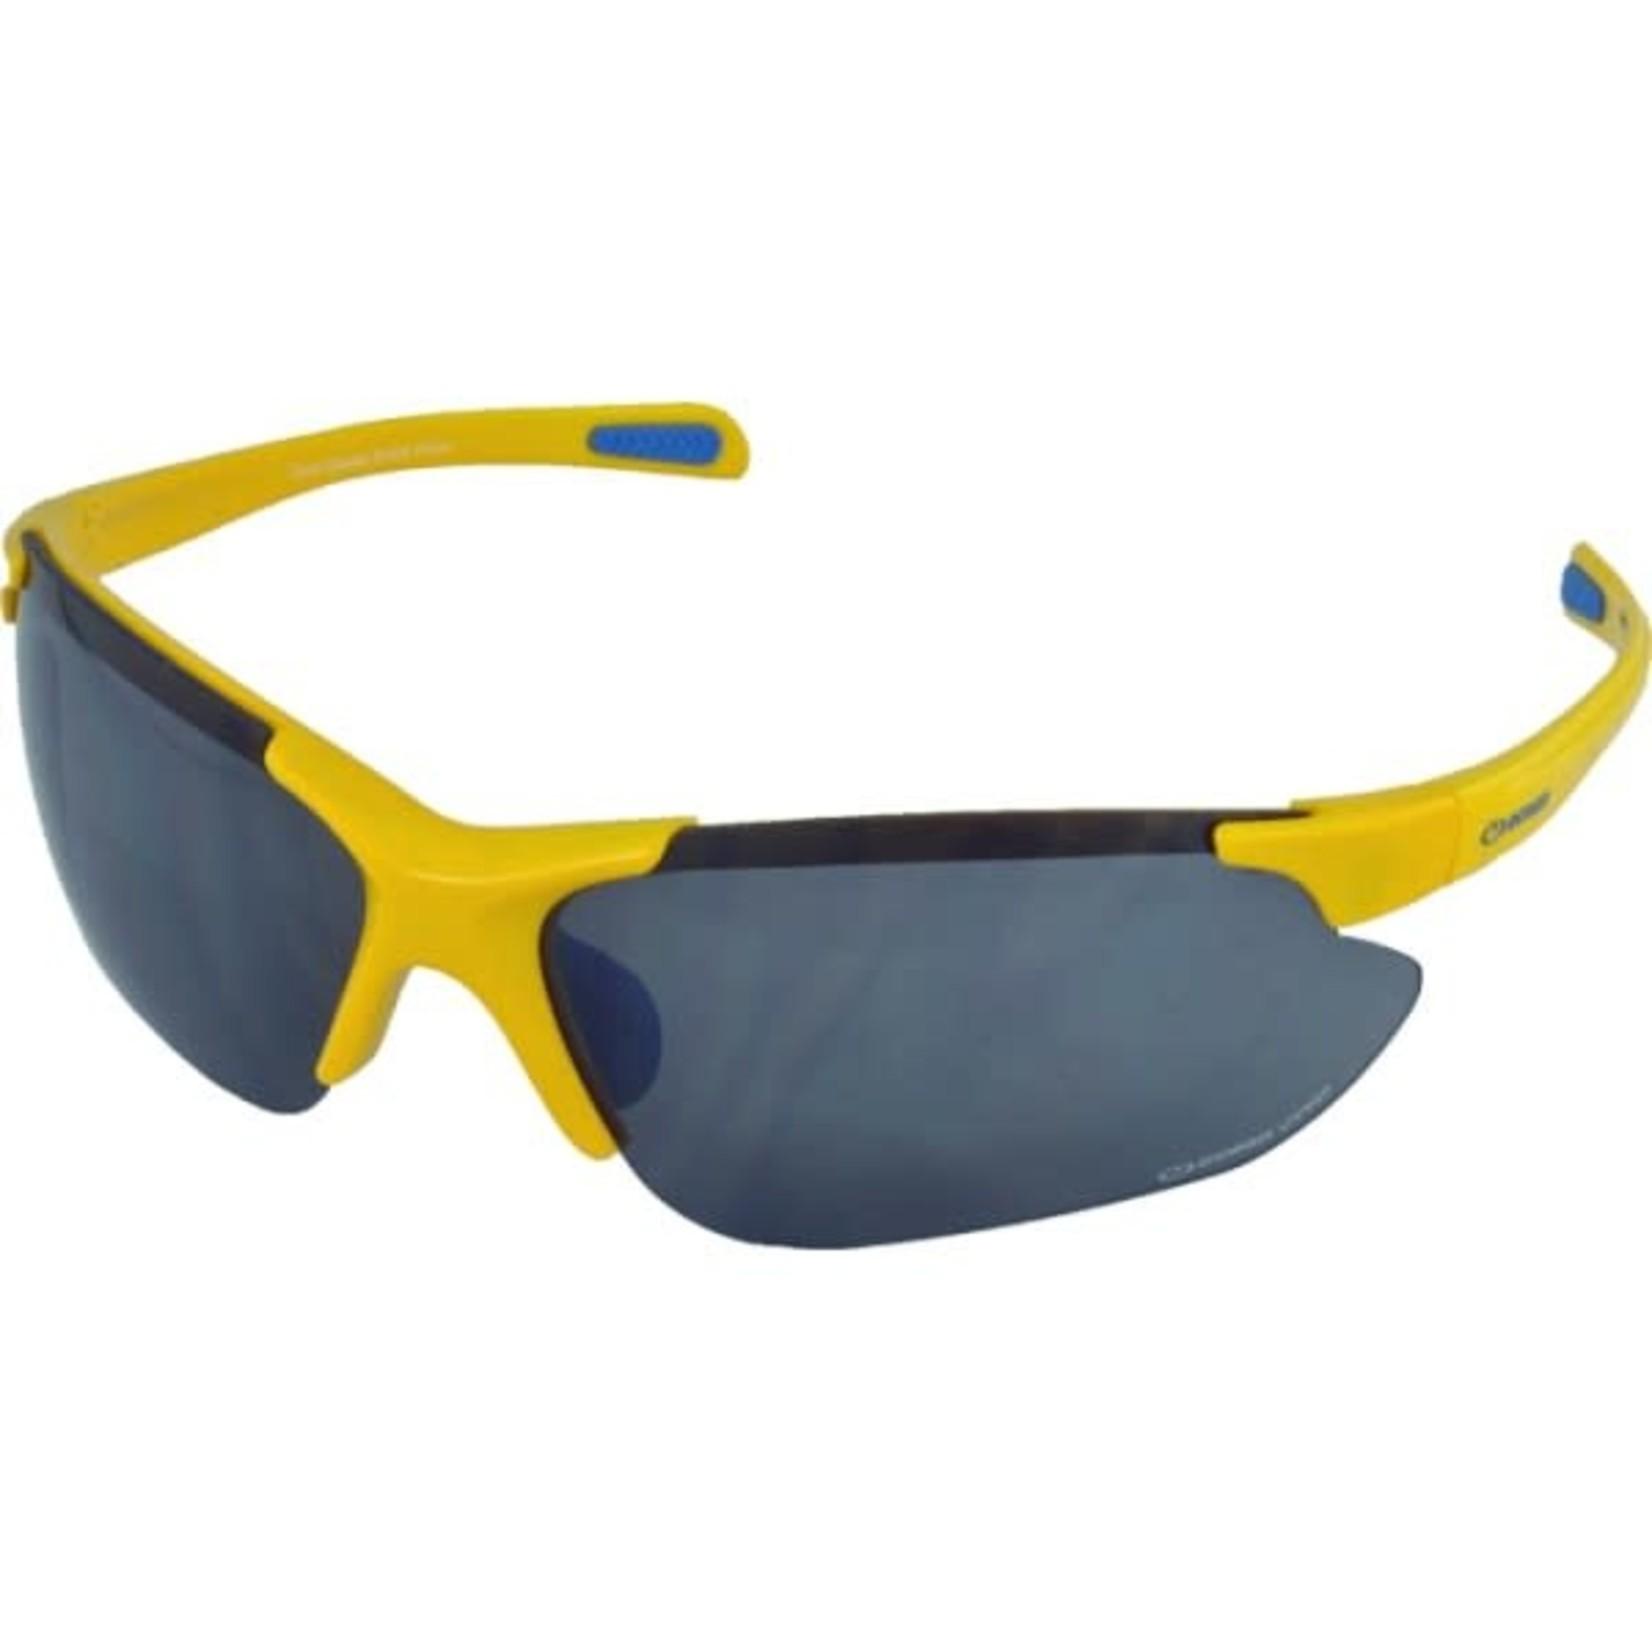 Ocean Sunglasses 30-404 UV 400 Yellow